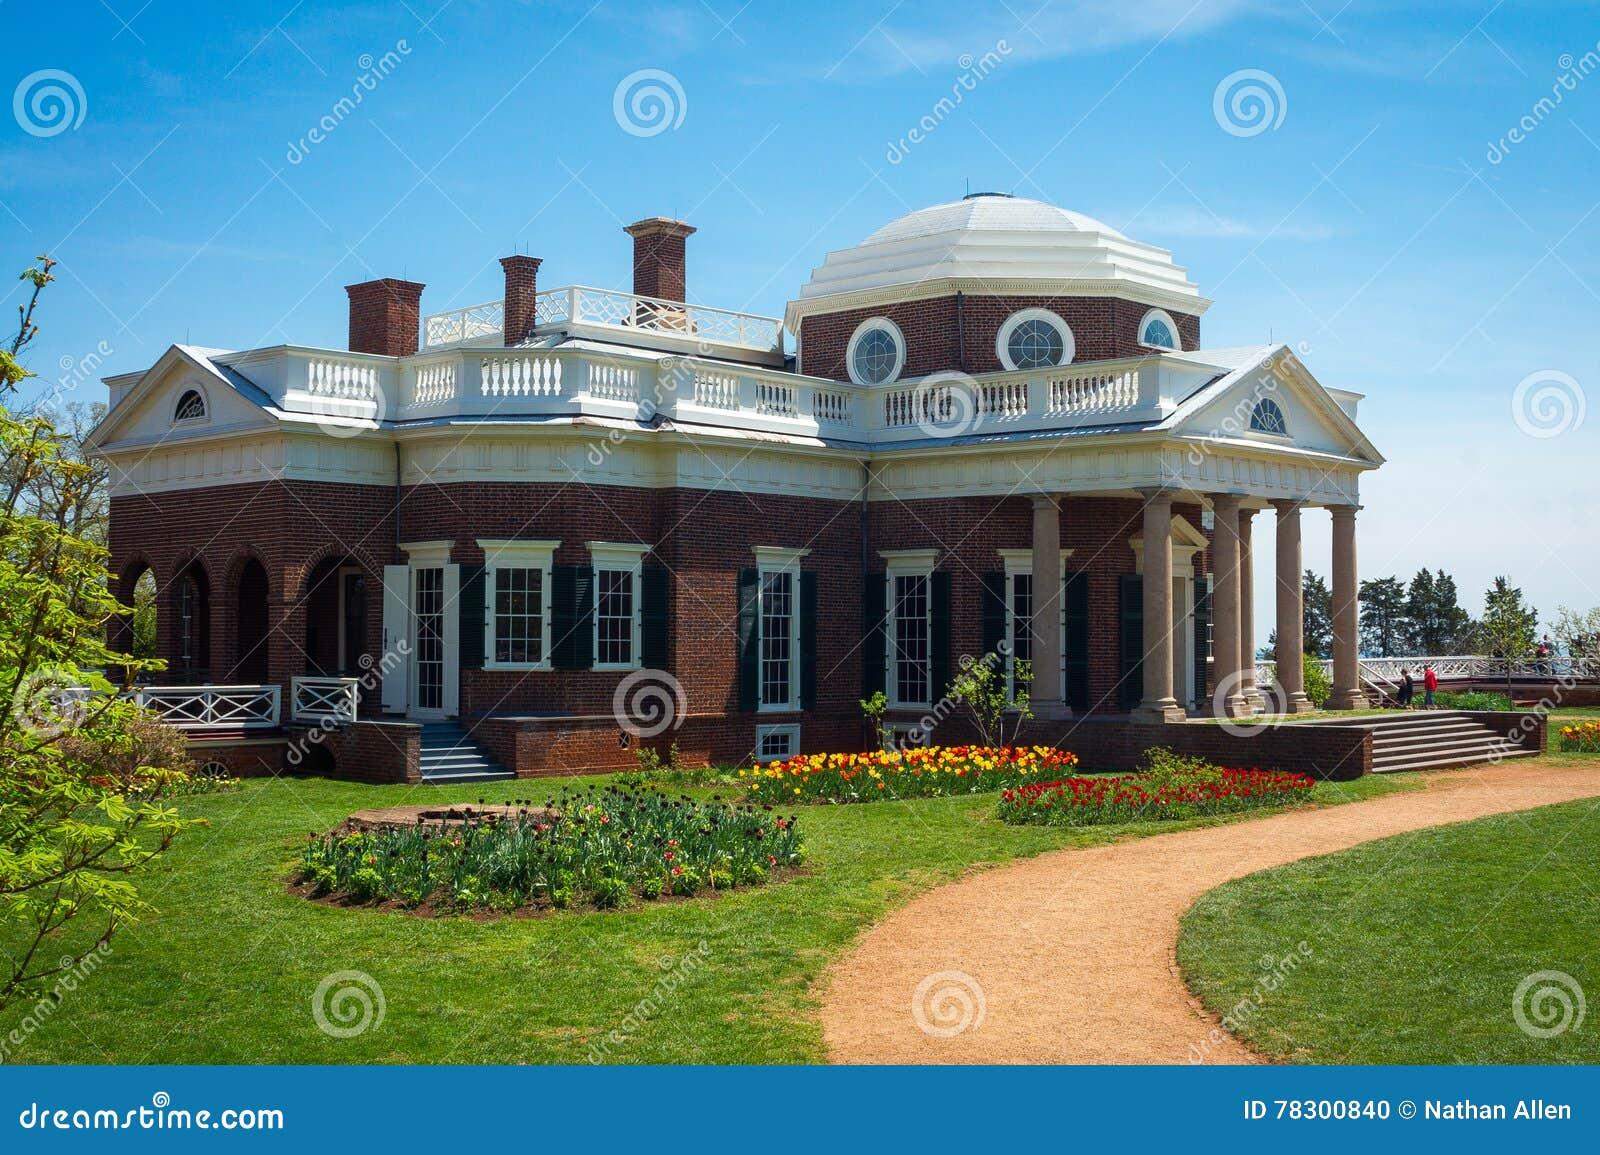 Monticello Thomas Jefferson S Home Stock Photo Image Of Columns